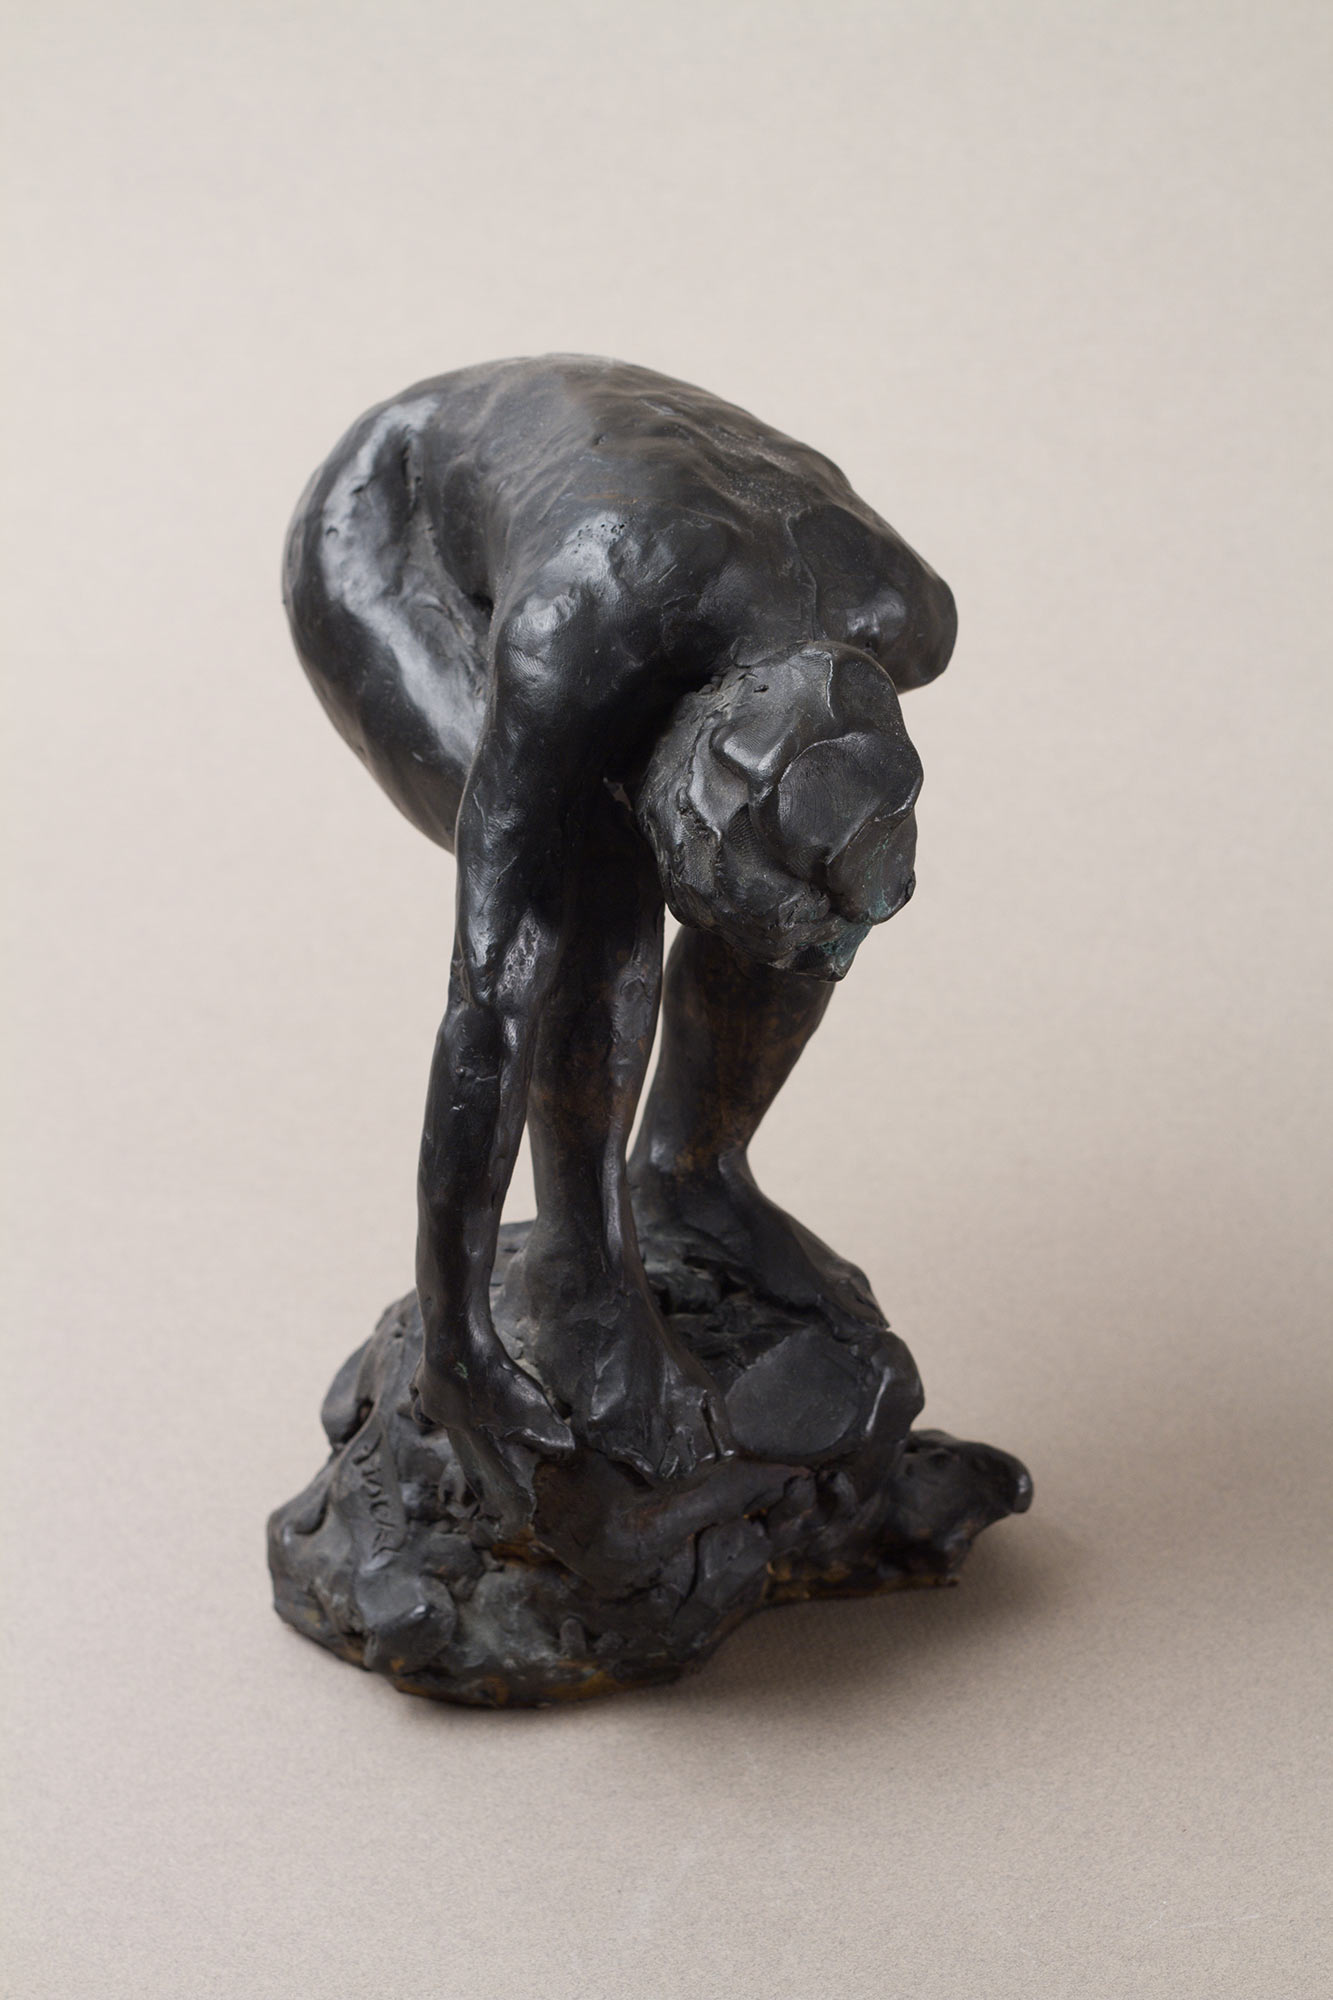 Bending Woman maquette, 1990.